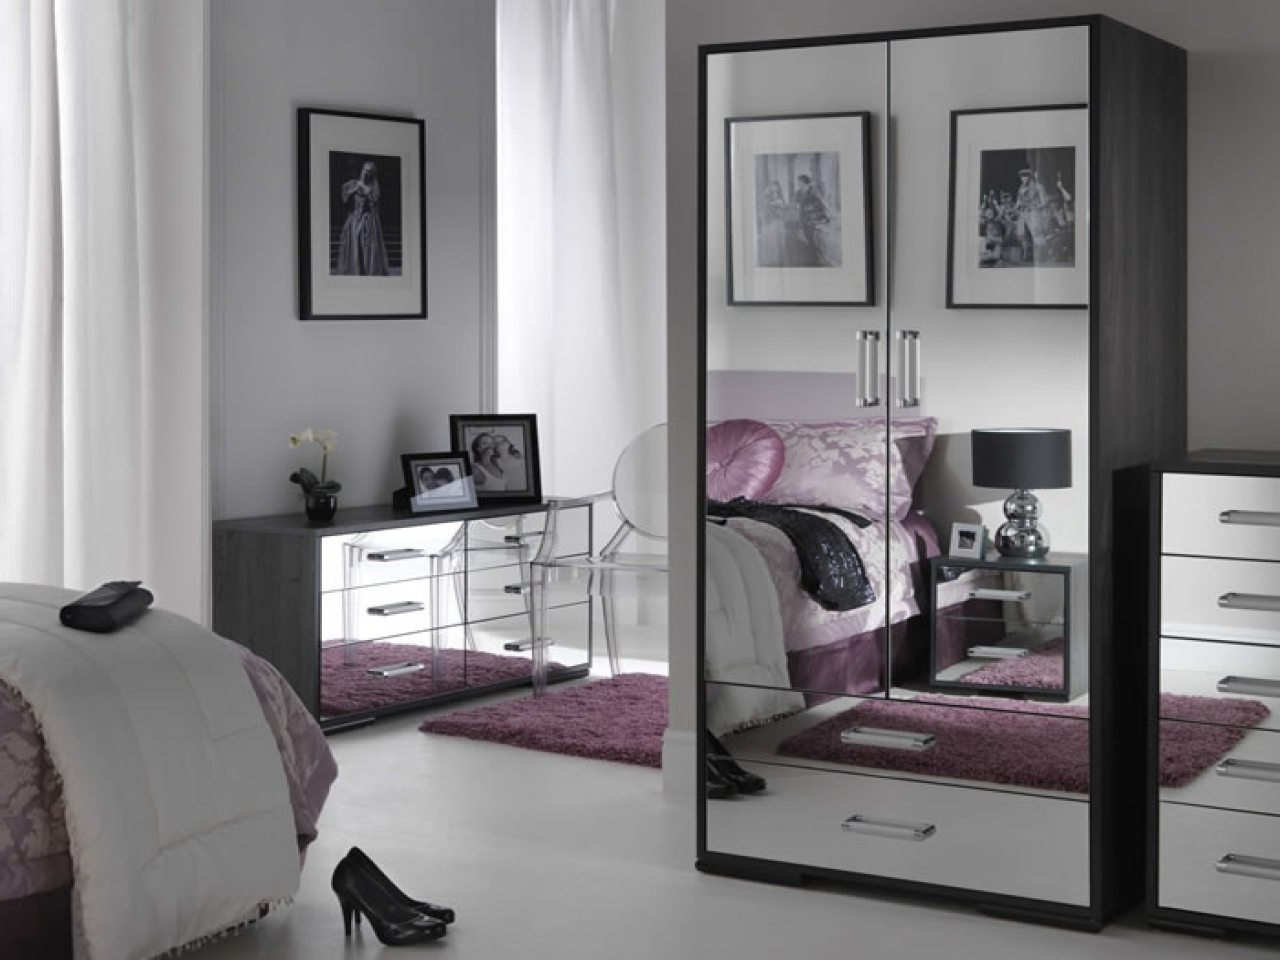 black-mirrored-glass-bedroom-furniture-photo-13